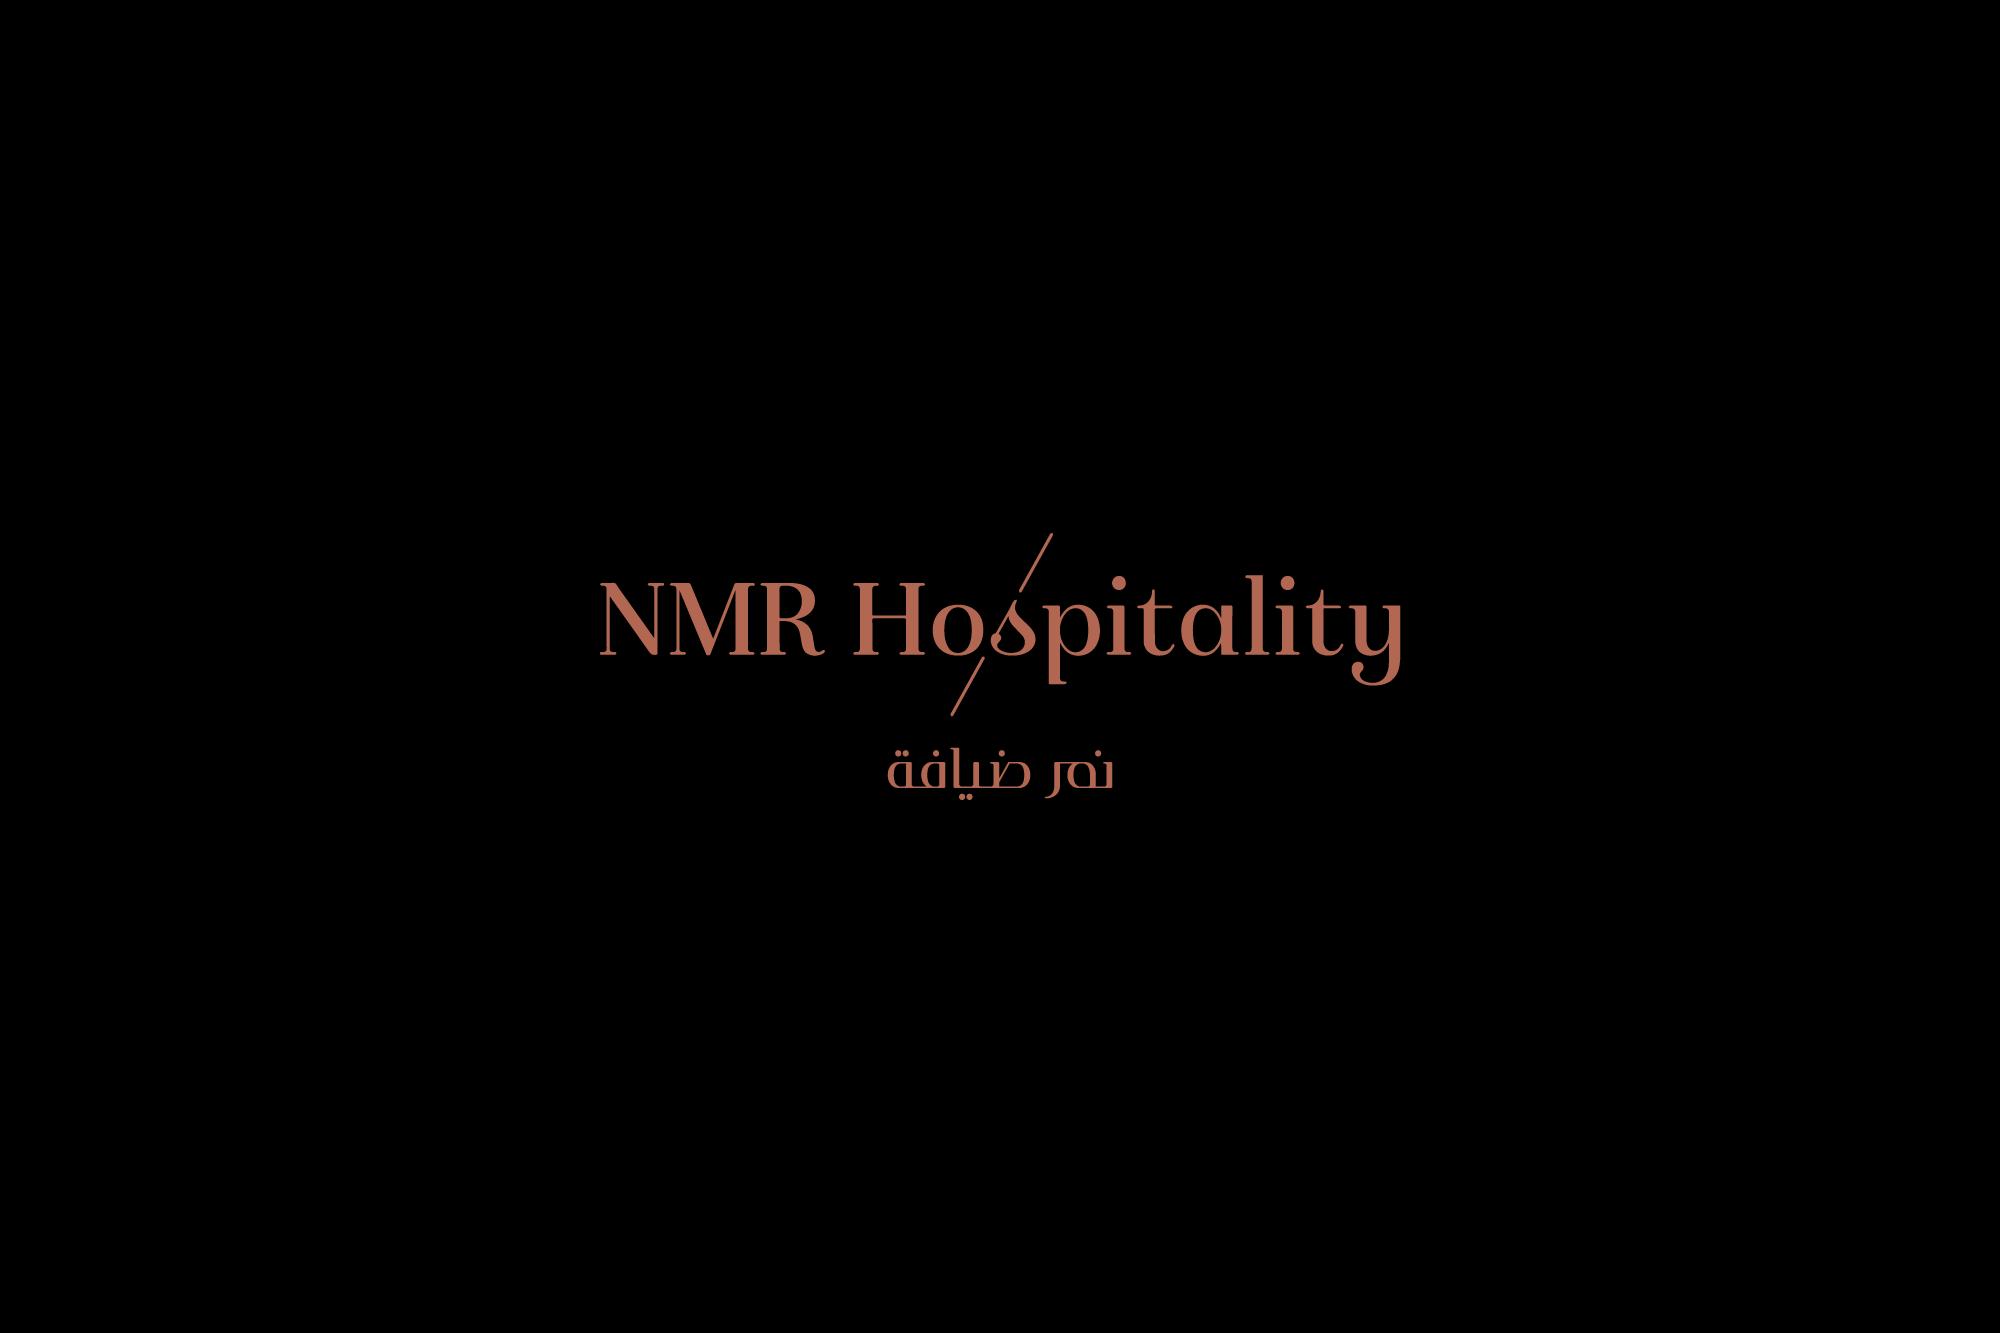 NMR_Hospitality_Logo copy 2